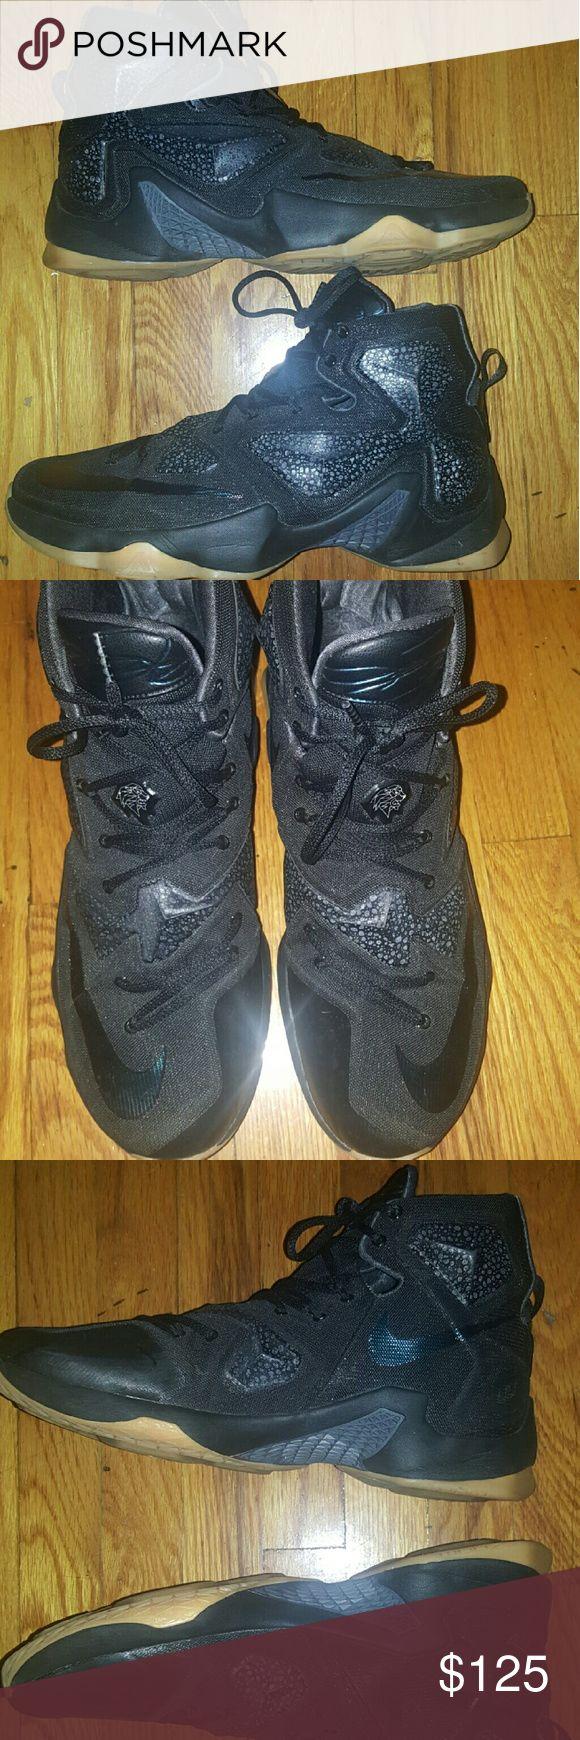 Nike LeBron 13 Like New Size 13 Black and Gum fits like a size 12 Nike Shoes Sneakers